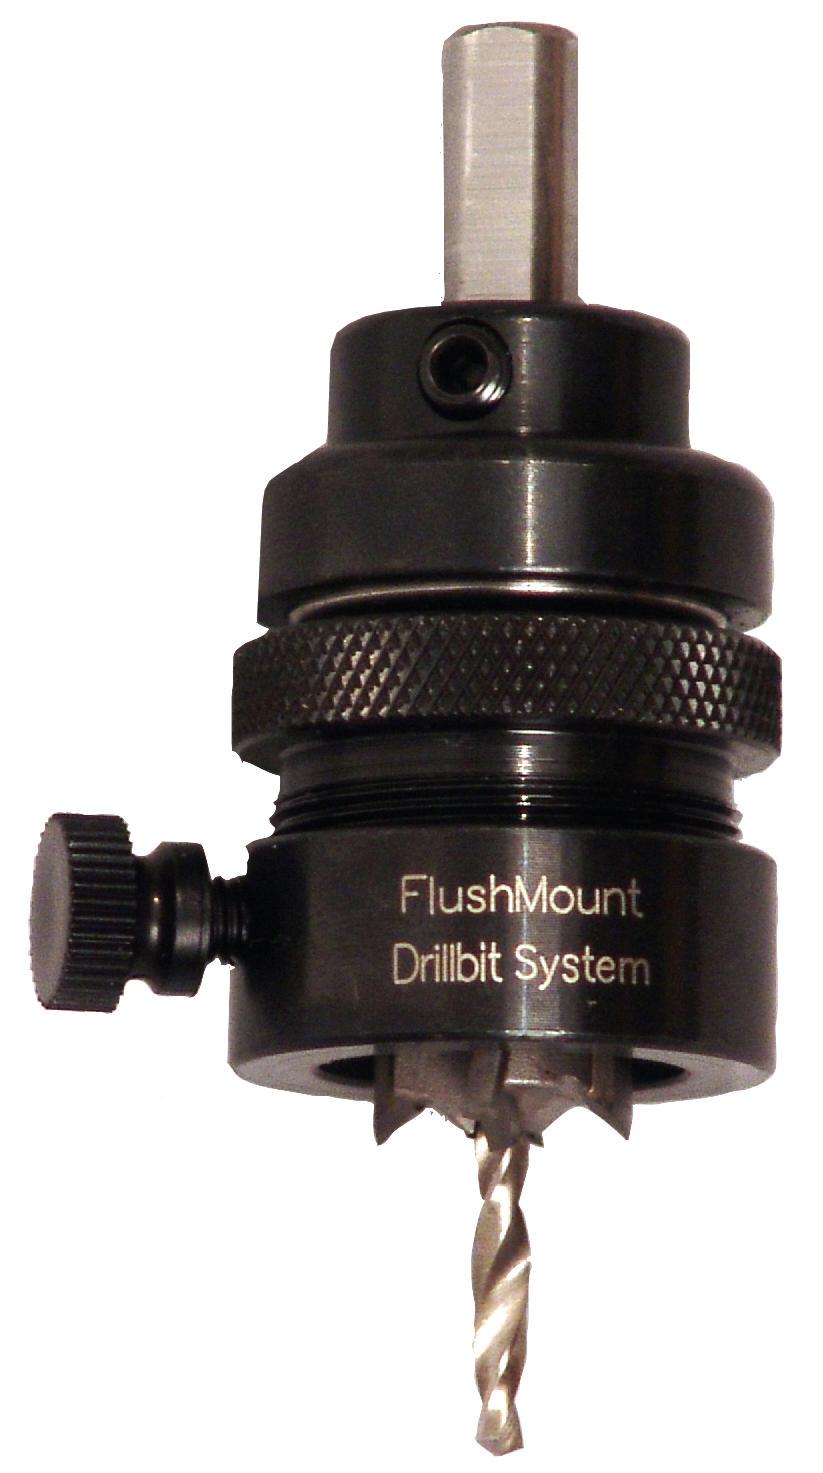 Hafele 001.24.210 Flushmount Drill Bit System